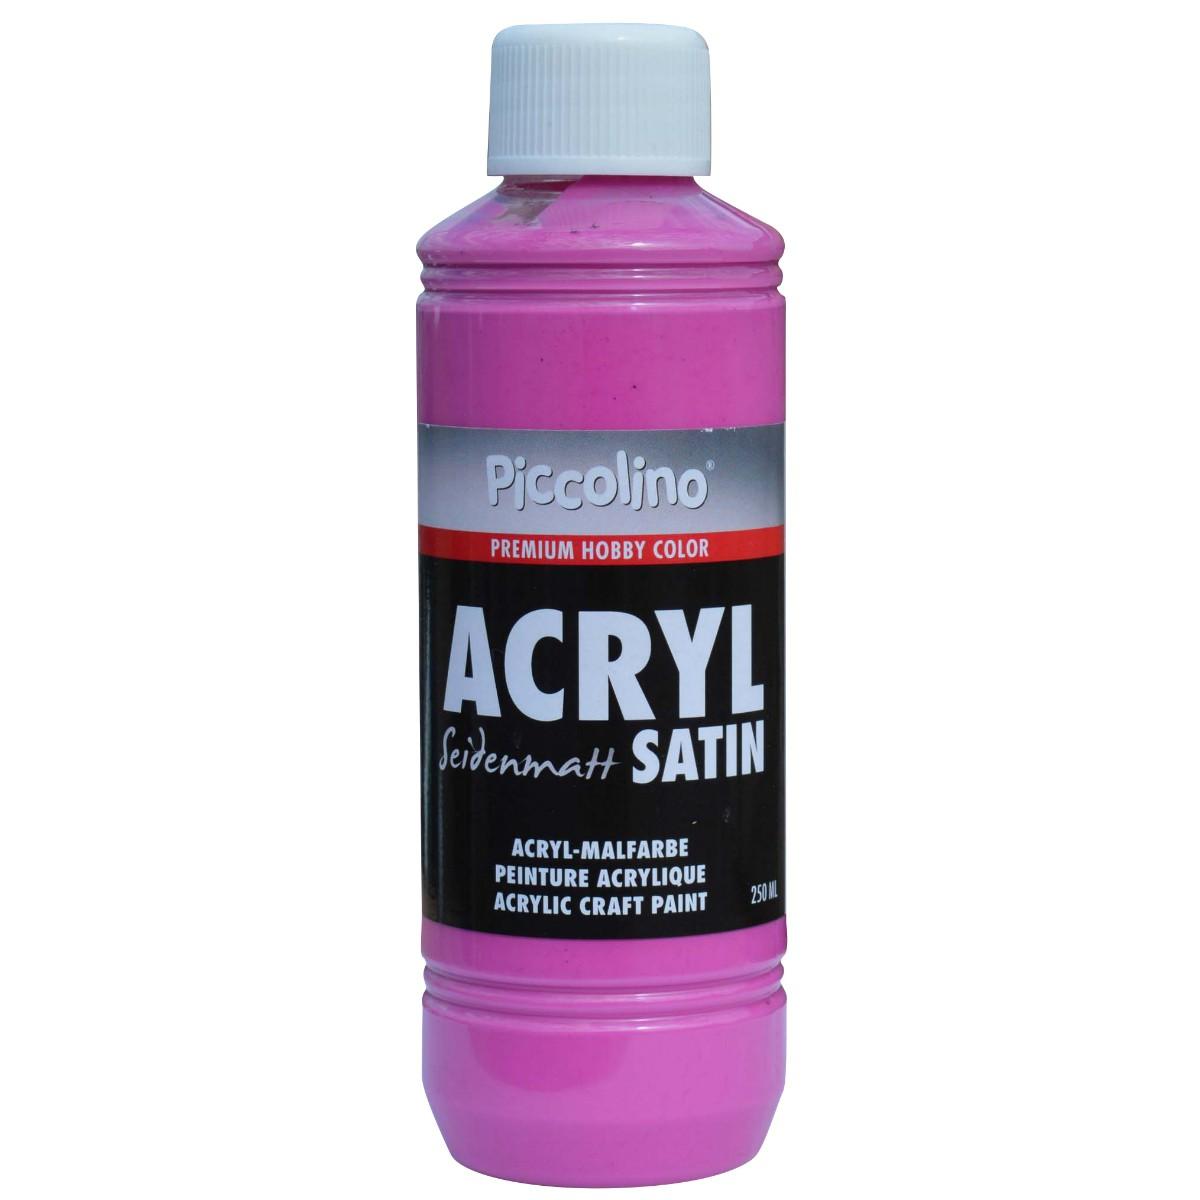 Acrylfarbe seidenmatt Pink 250ml Flasche - Piccolino Acryl Satin, Premium Hobby Color